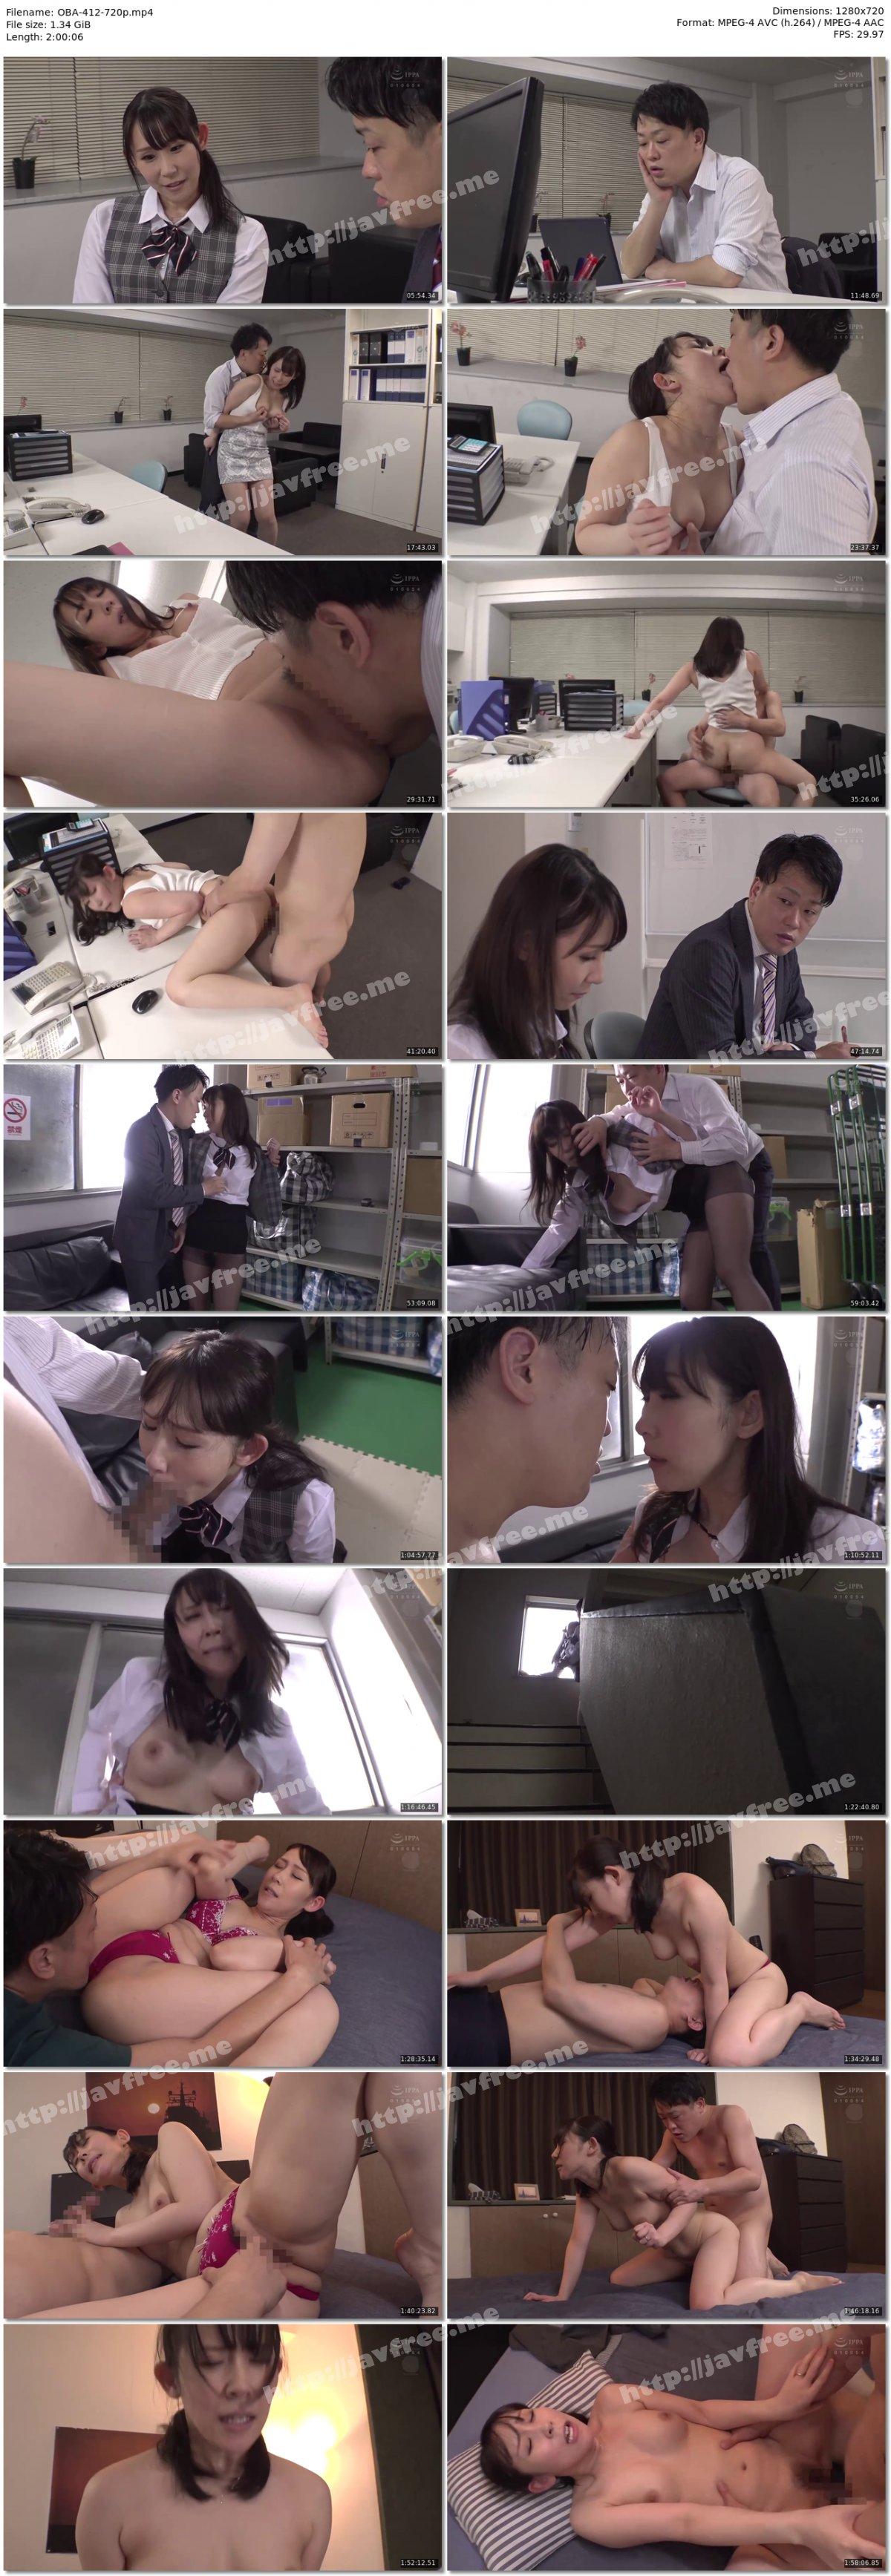 [HD][OBA-412] こんなおばさんだけど、本当に私でいいの…? ~職場の若者と無我夢中の不倫性交~ 田中美矢 - image OBA-412-720p on https://javfree.me